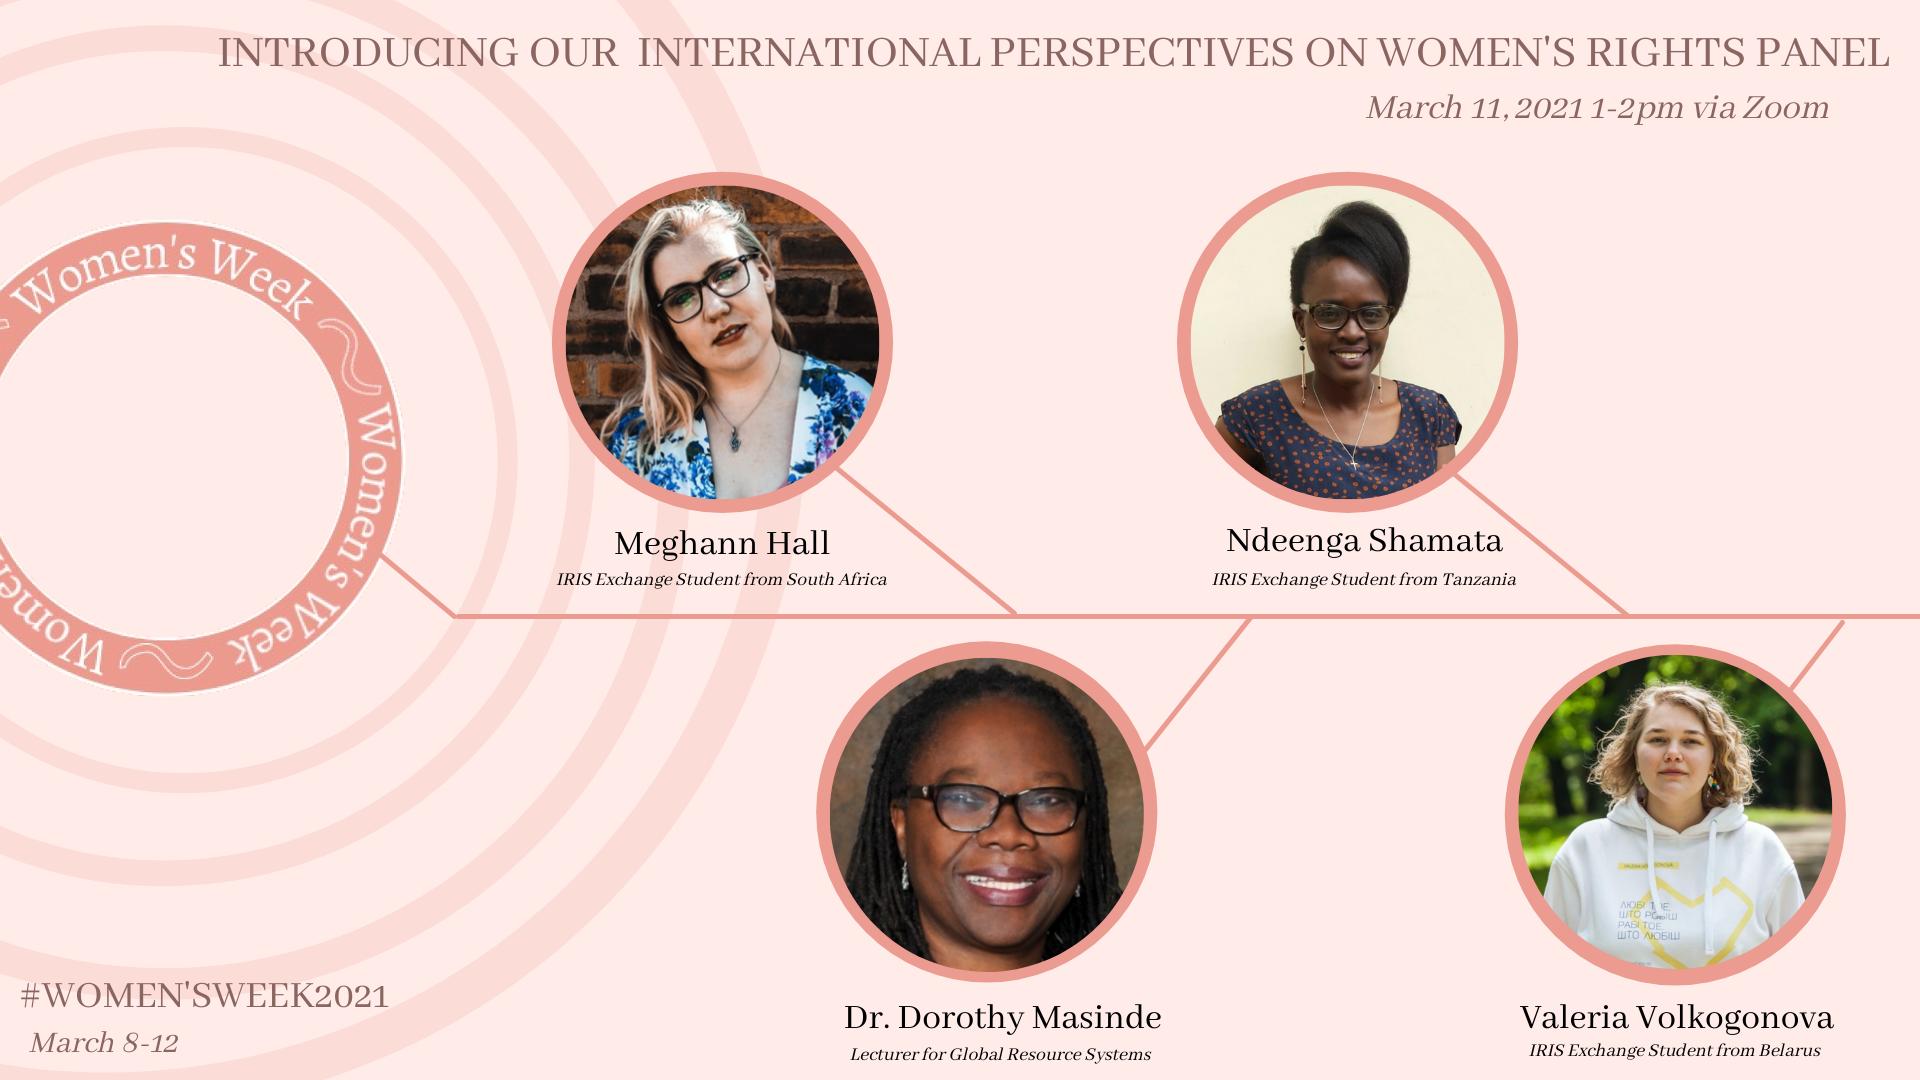 International Perspectives Panel